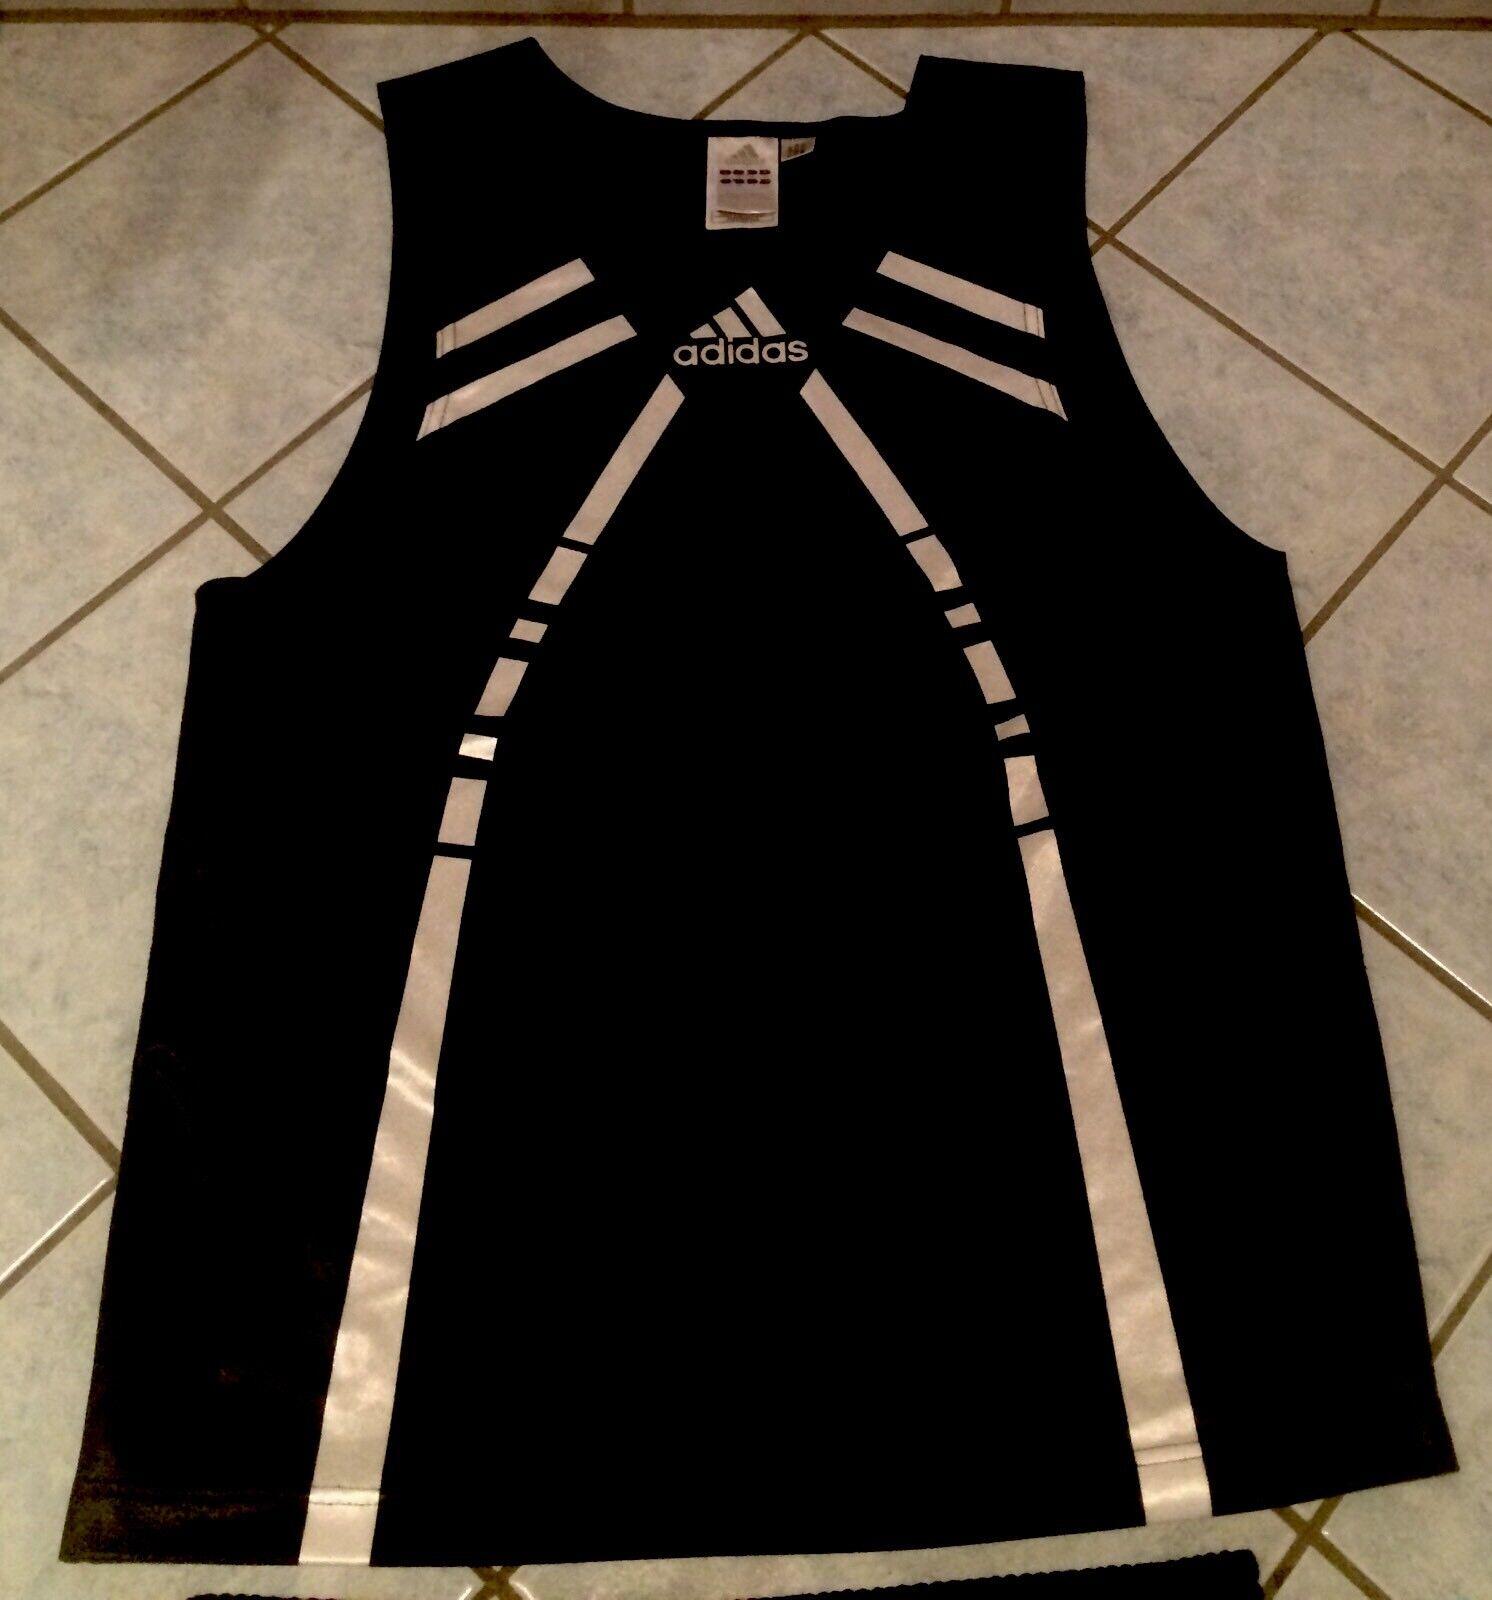 Basketball-Trikot Basketball-Trikot Basketball-Trikot ADIDAS - Kleidung Boxsport  Basketball  Kampfsport 539b7f